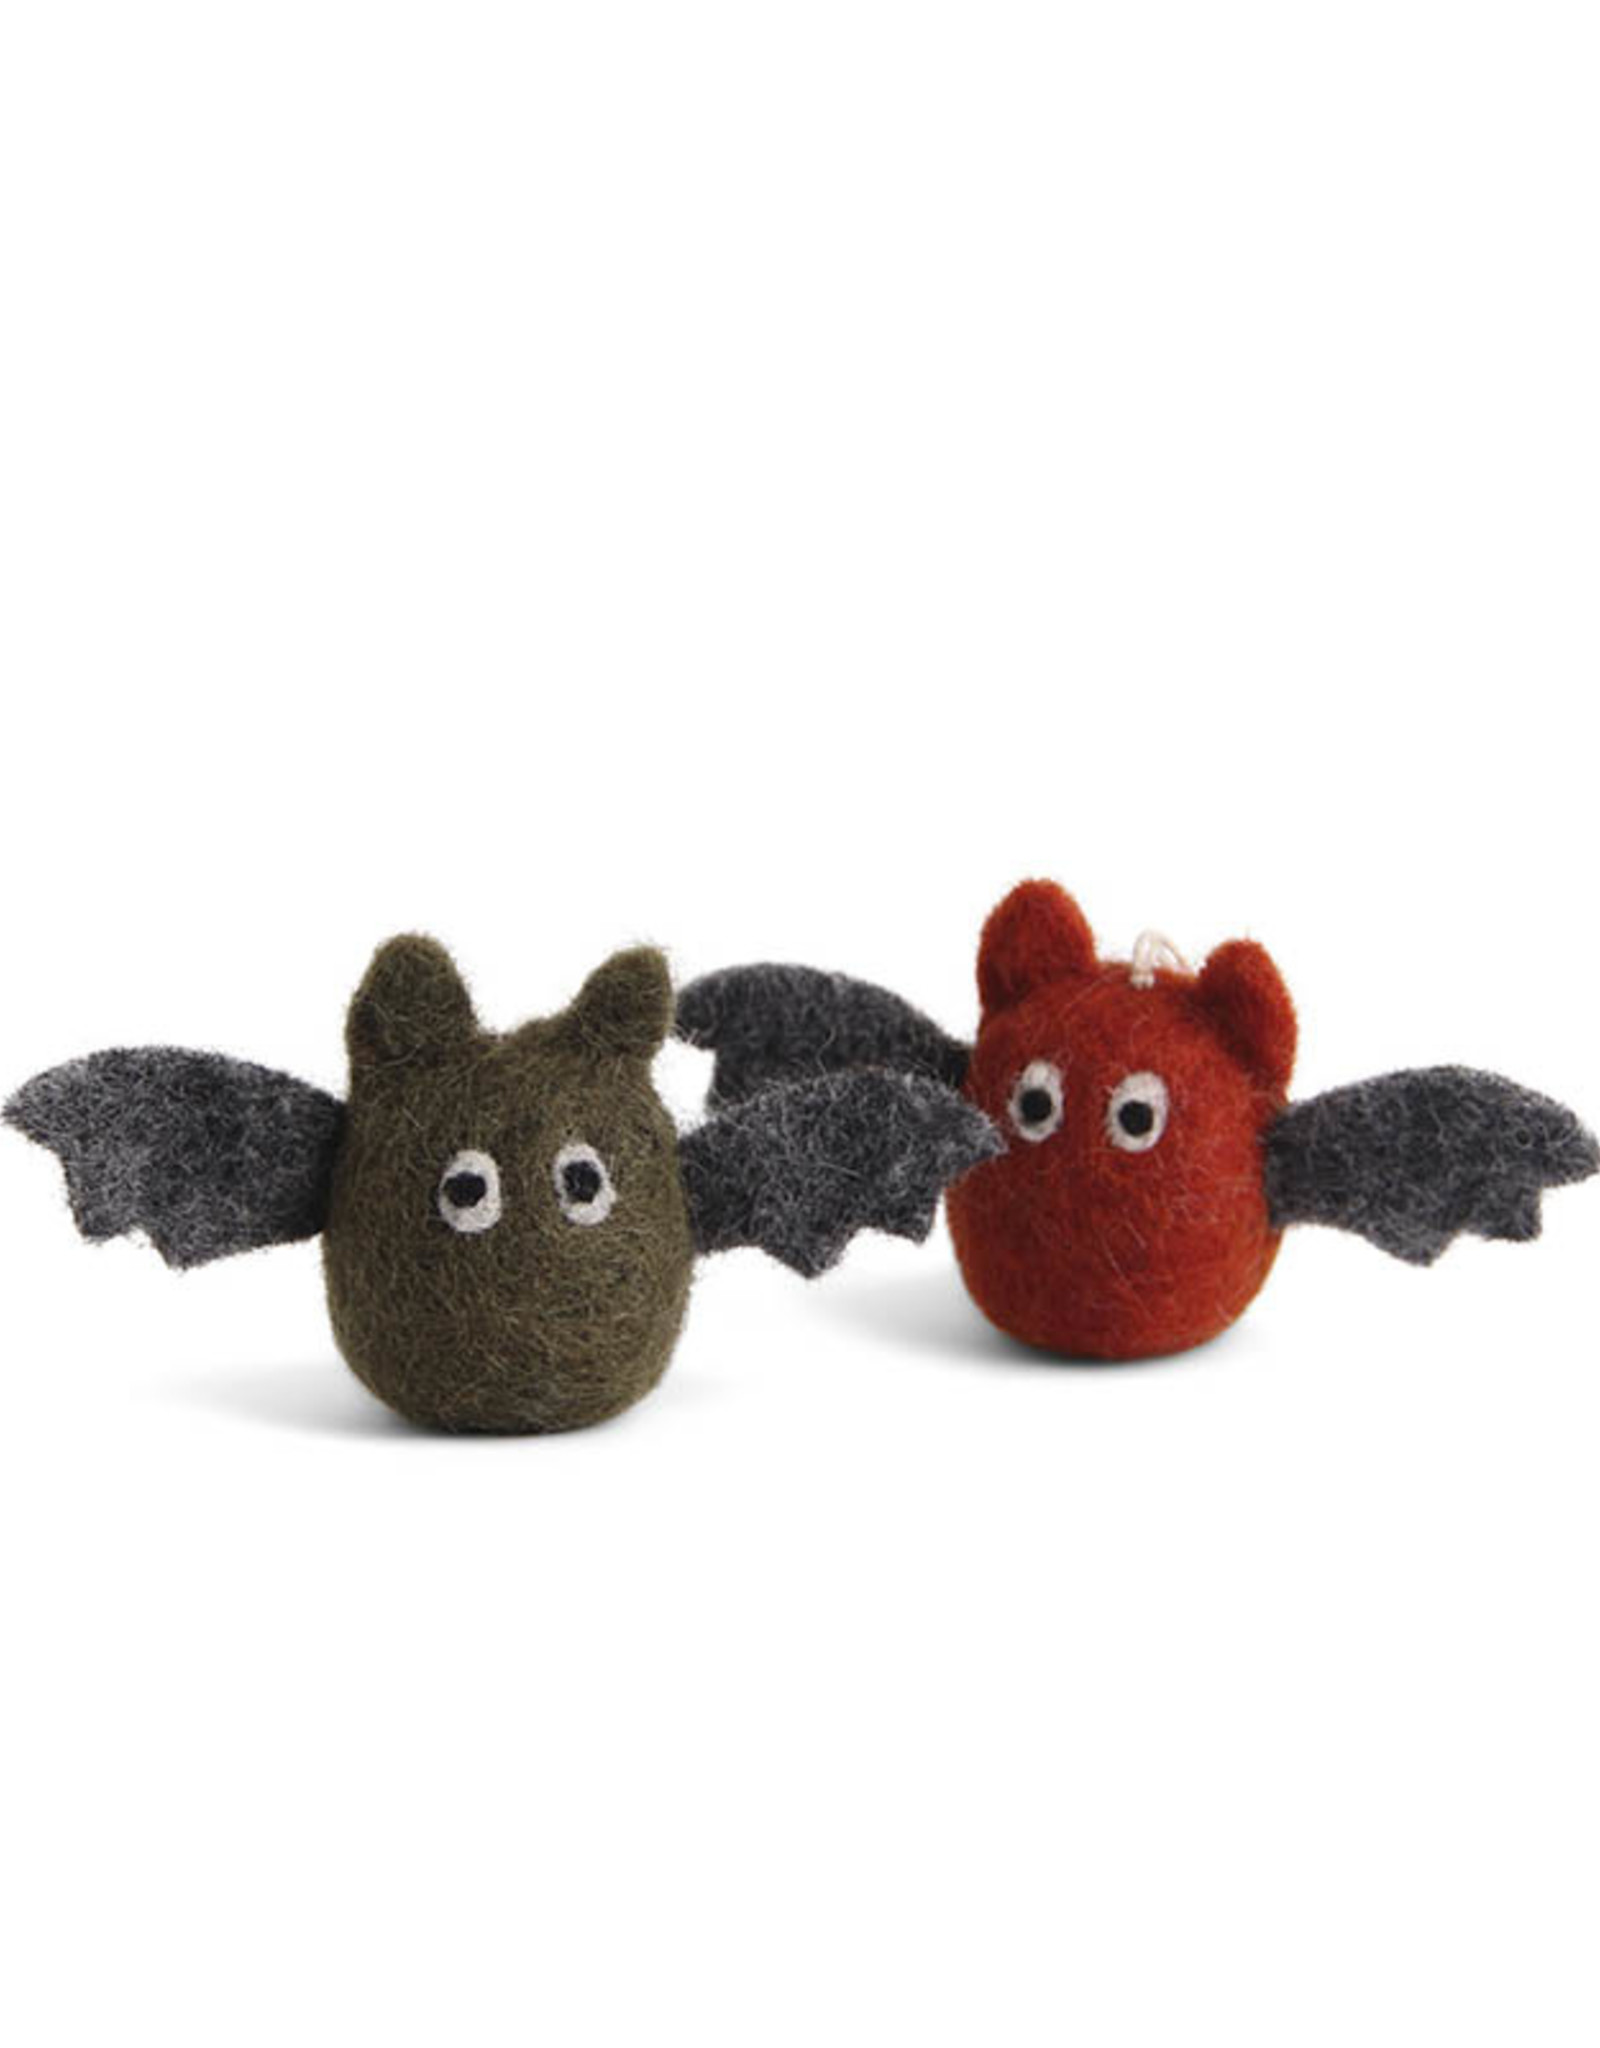 EGS EGS Ornaments - Bats - Set 2